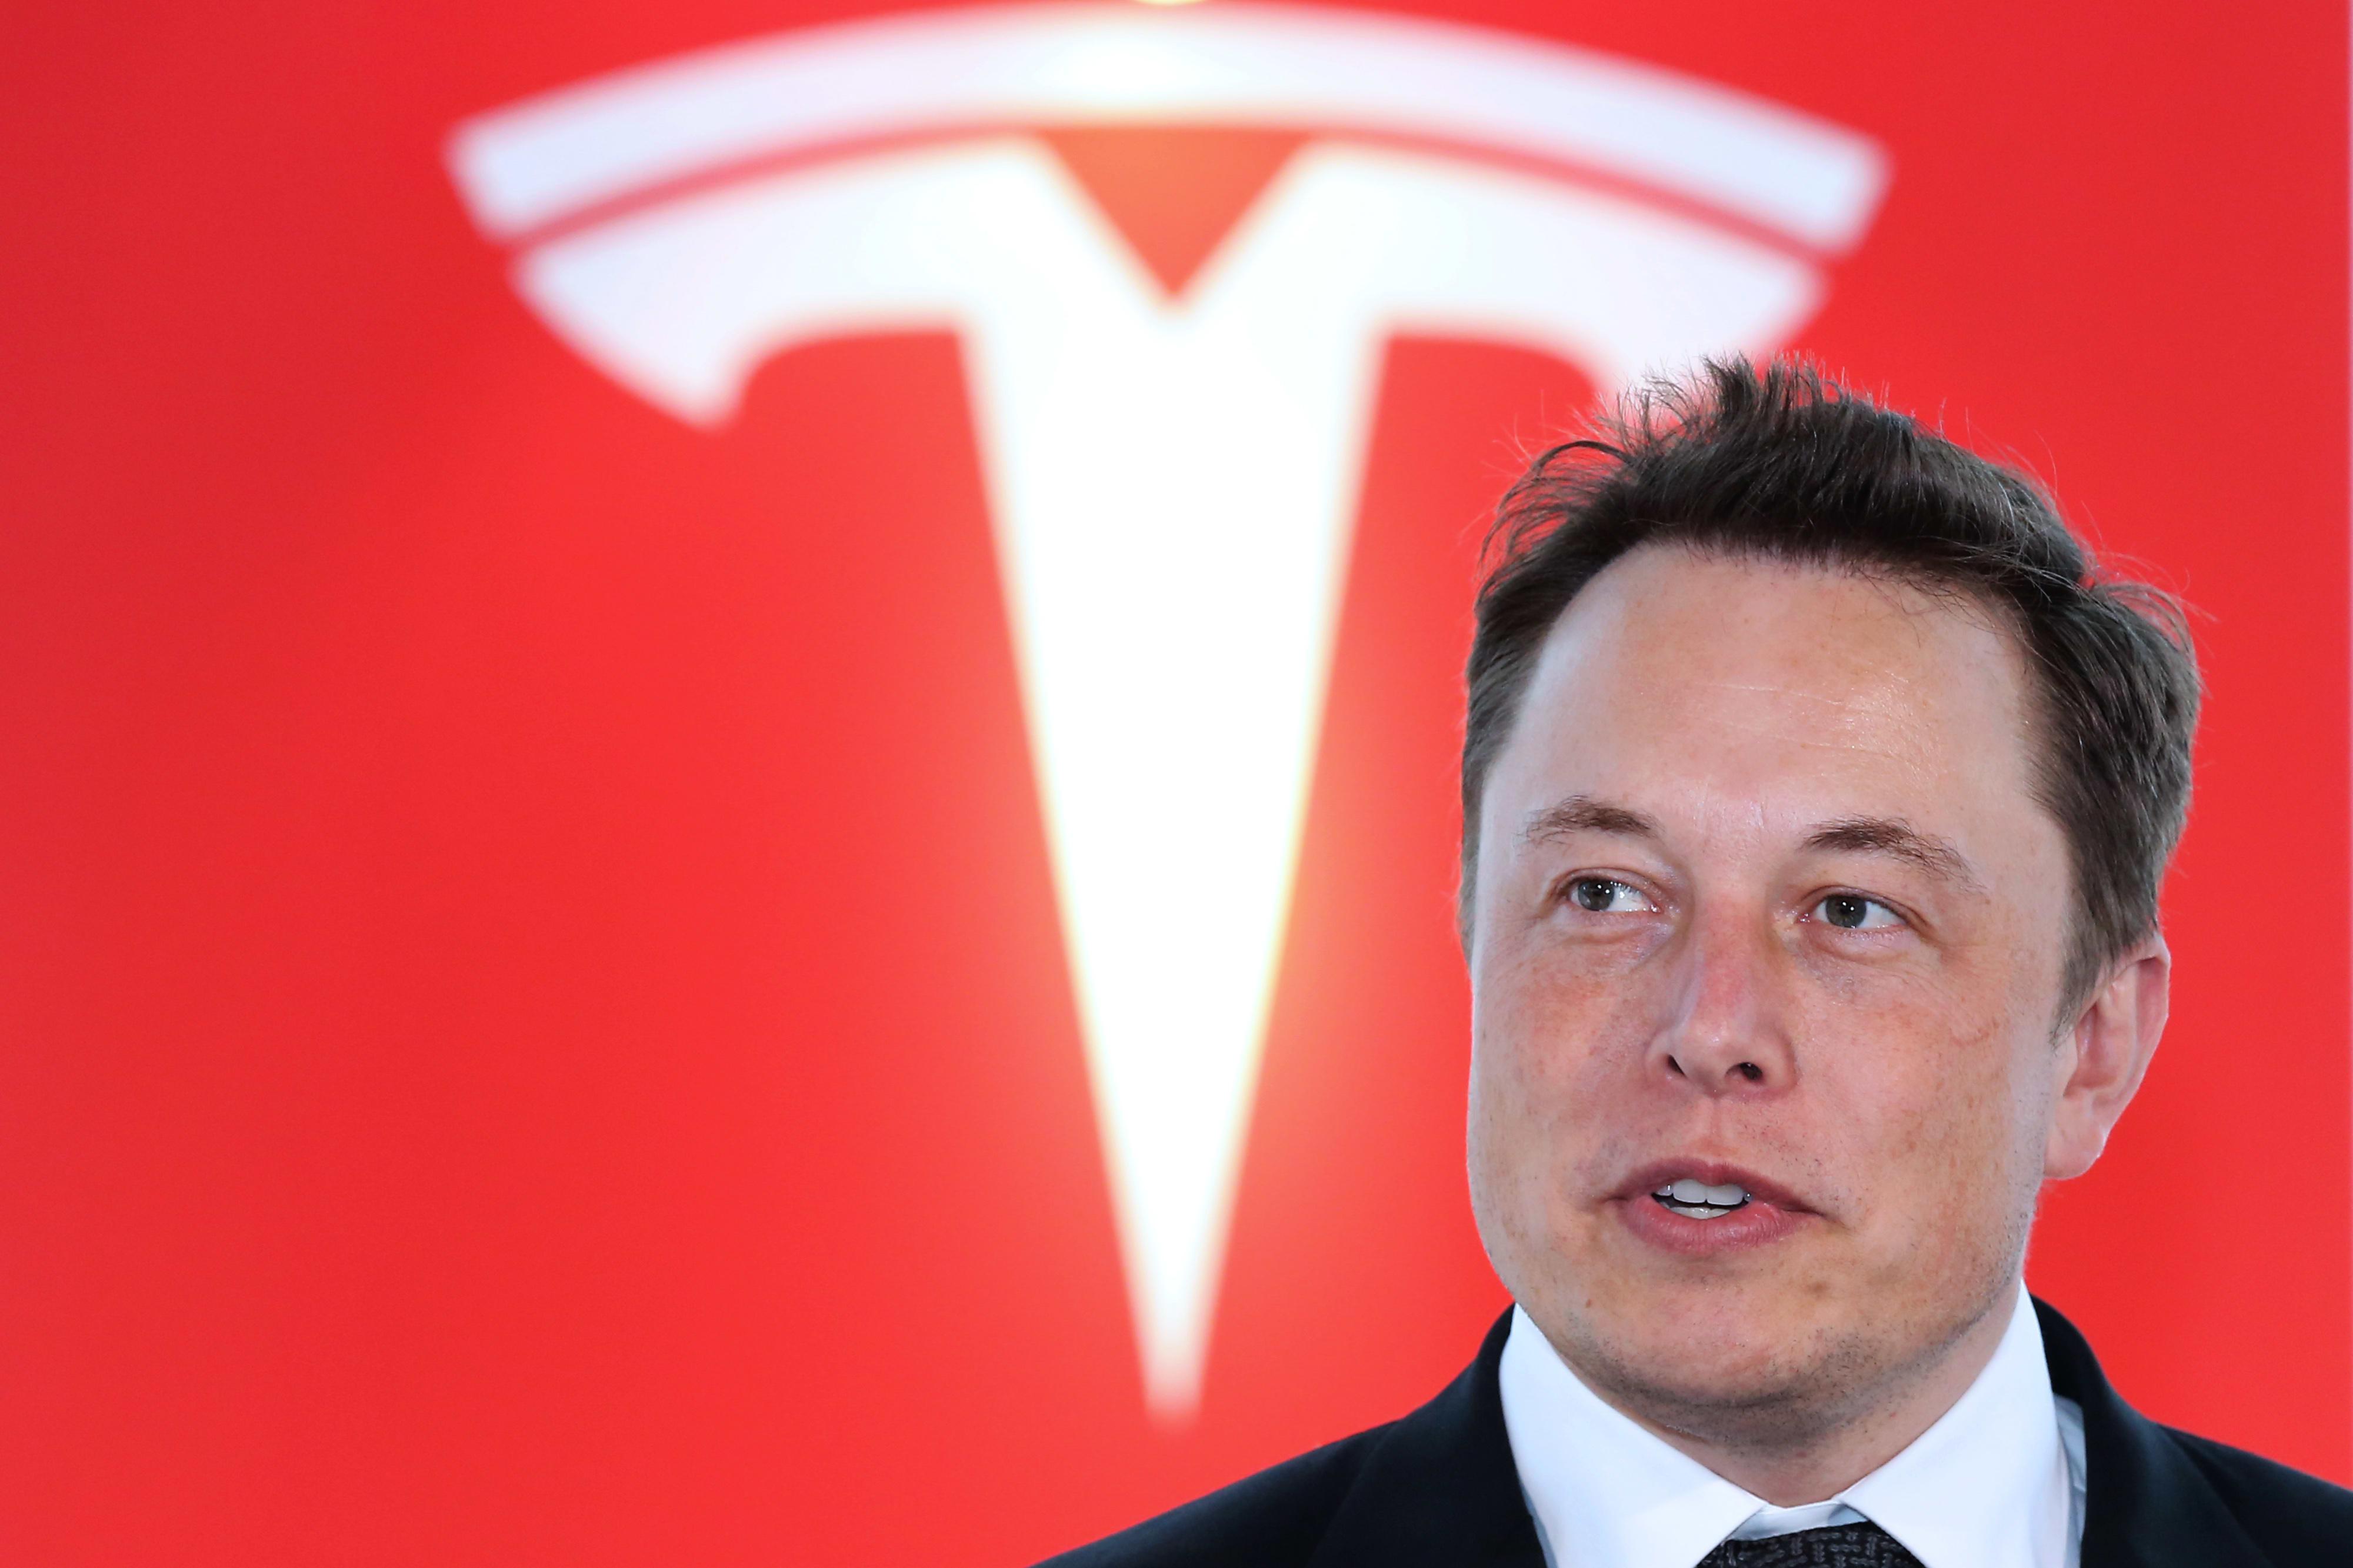 Stocks making the biggest moves midday: Tesla, PepsiCo, Netflix, Delta & more